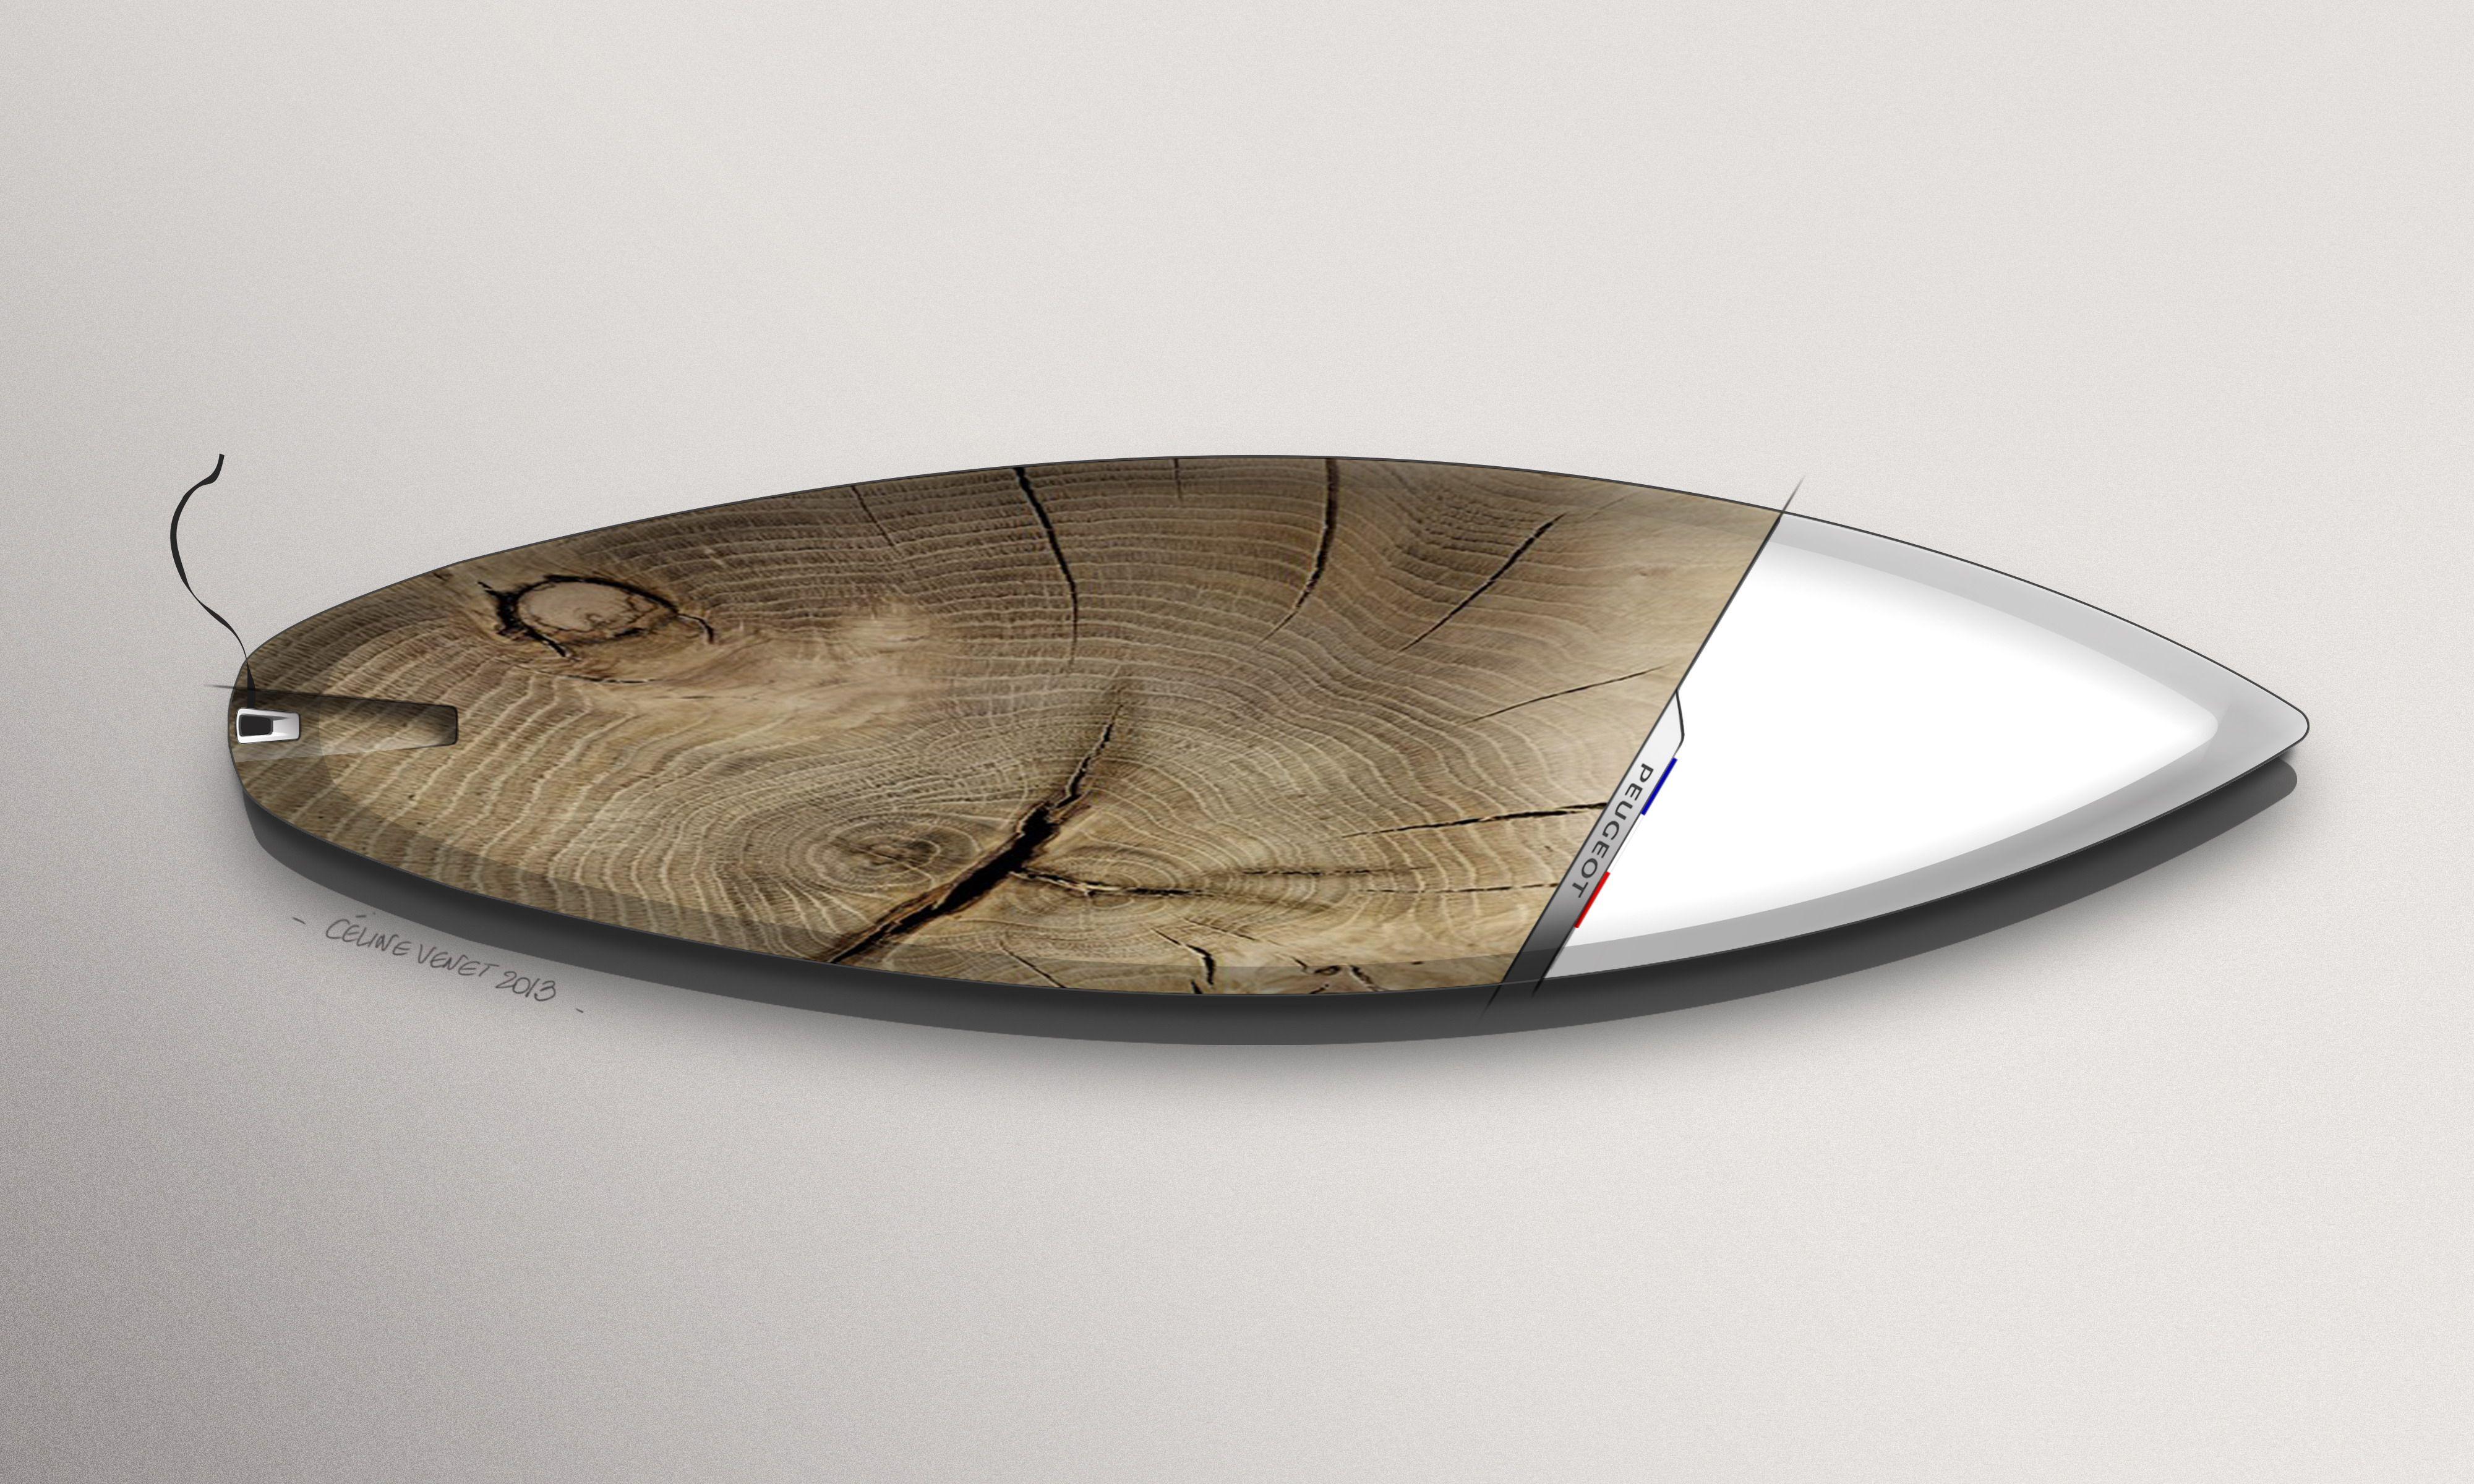 Peugeot Design Lab - GTi Surfboard Concept